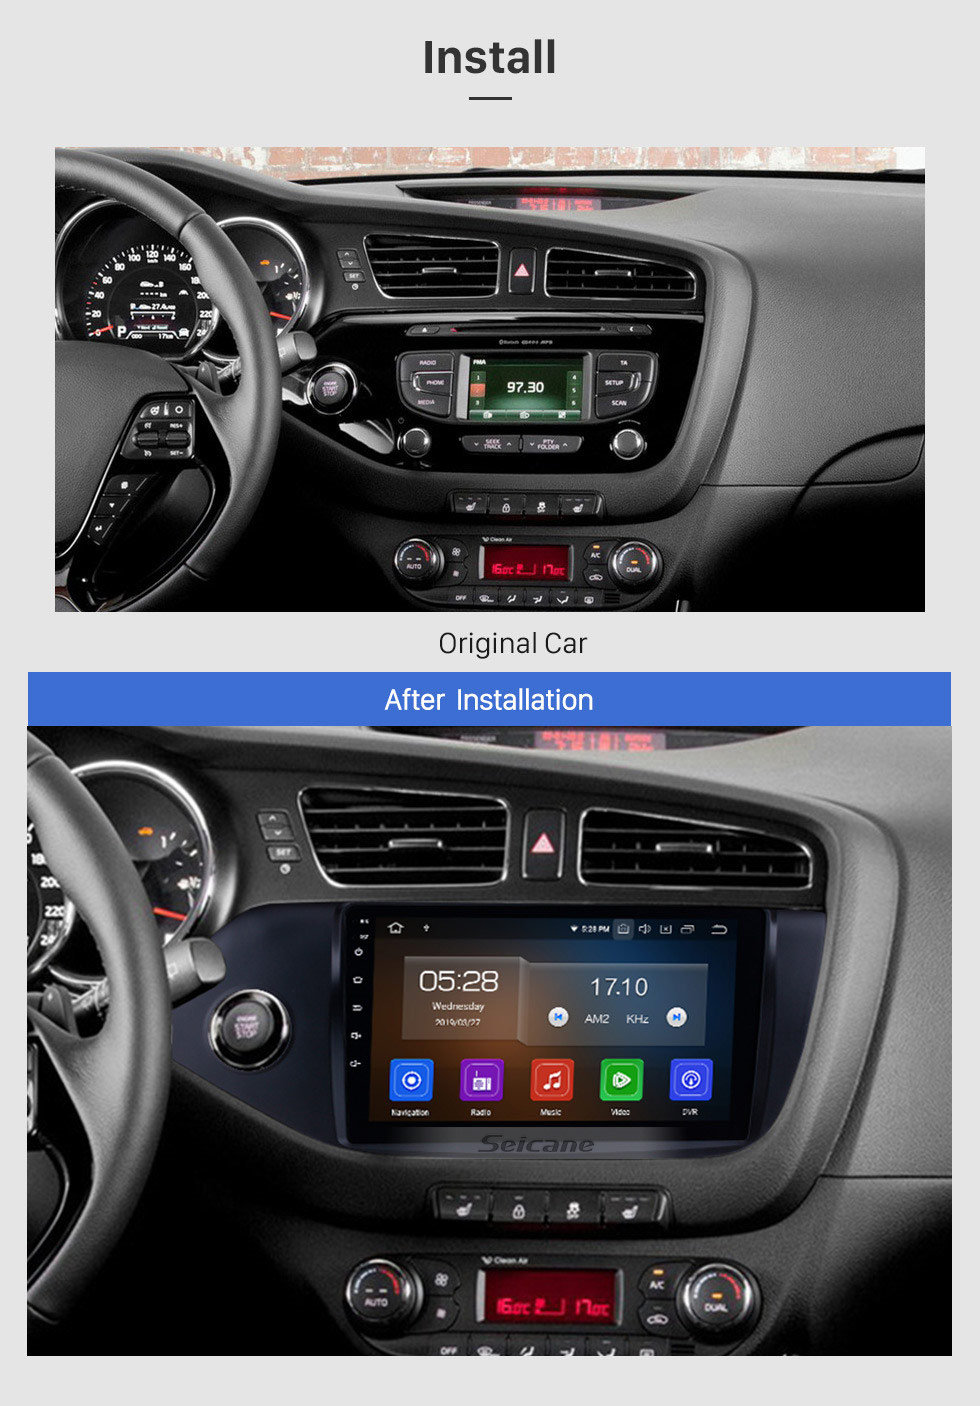 Seicane OEM 2012 2013 2014 Kia Ceed (LHD) 9 inch Android 9.0 GPS Navigation Bluetooth Car Radio Support CD DVD Player Backup Camera DAB+ DVR OBD2 Mirror Link WIFI USB SD Steering Wheel Control